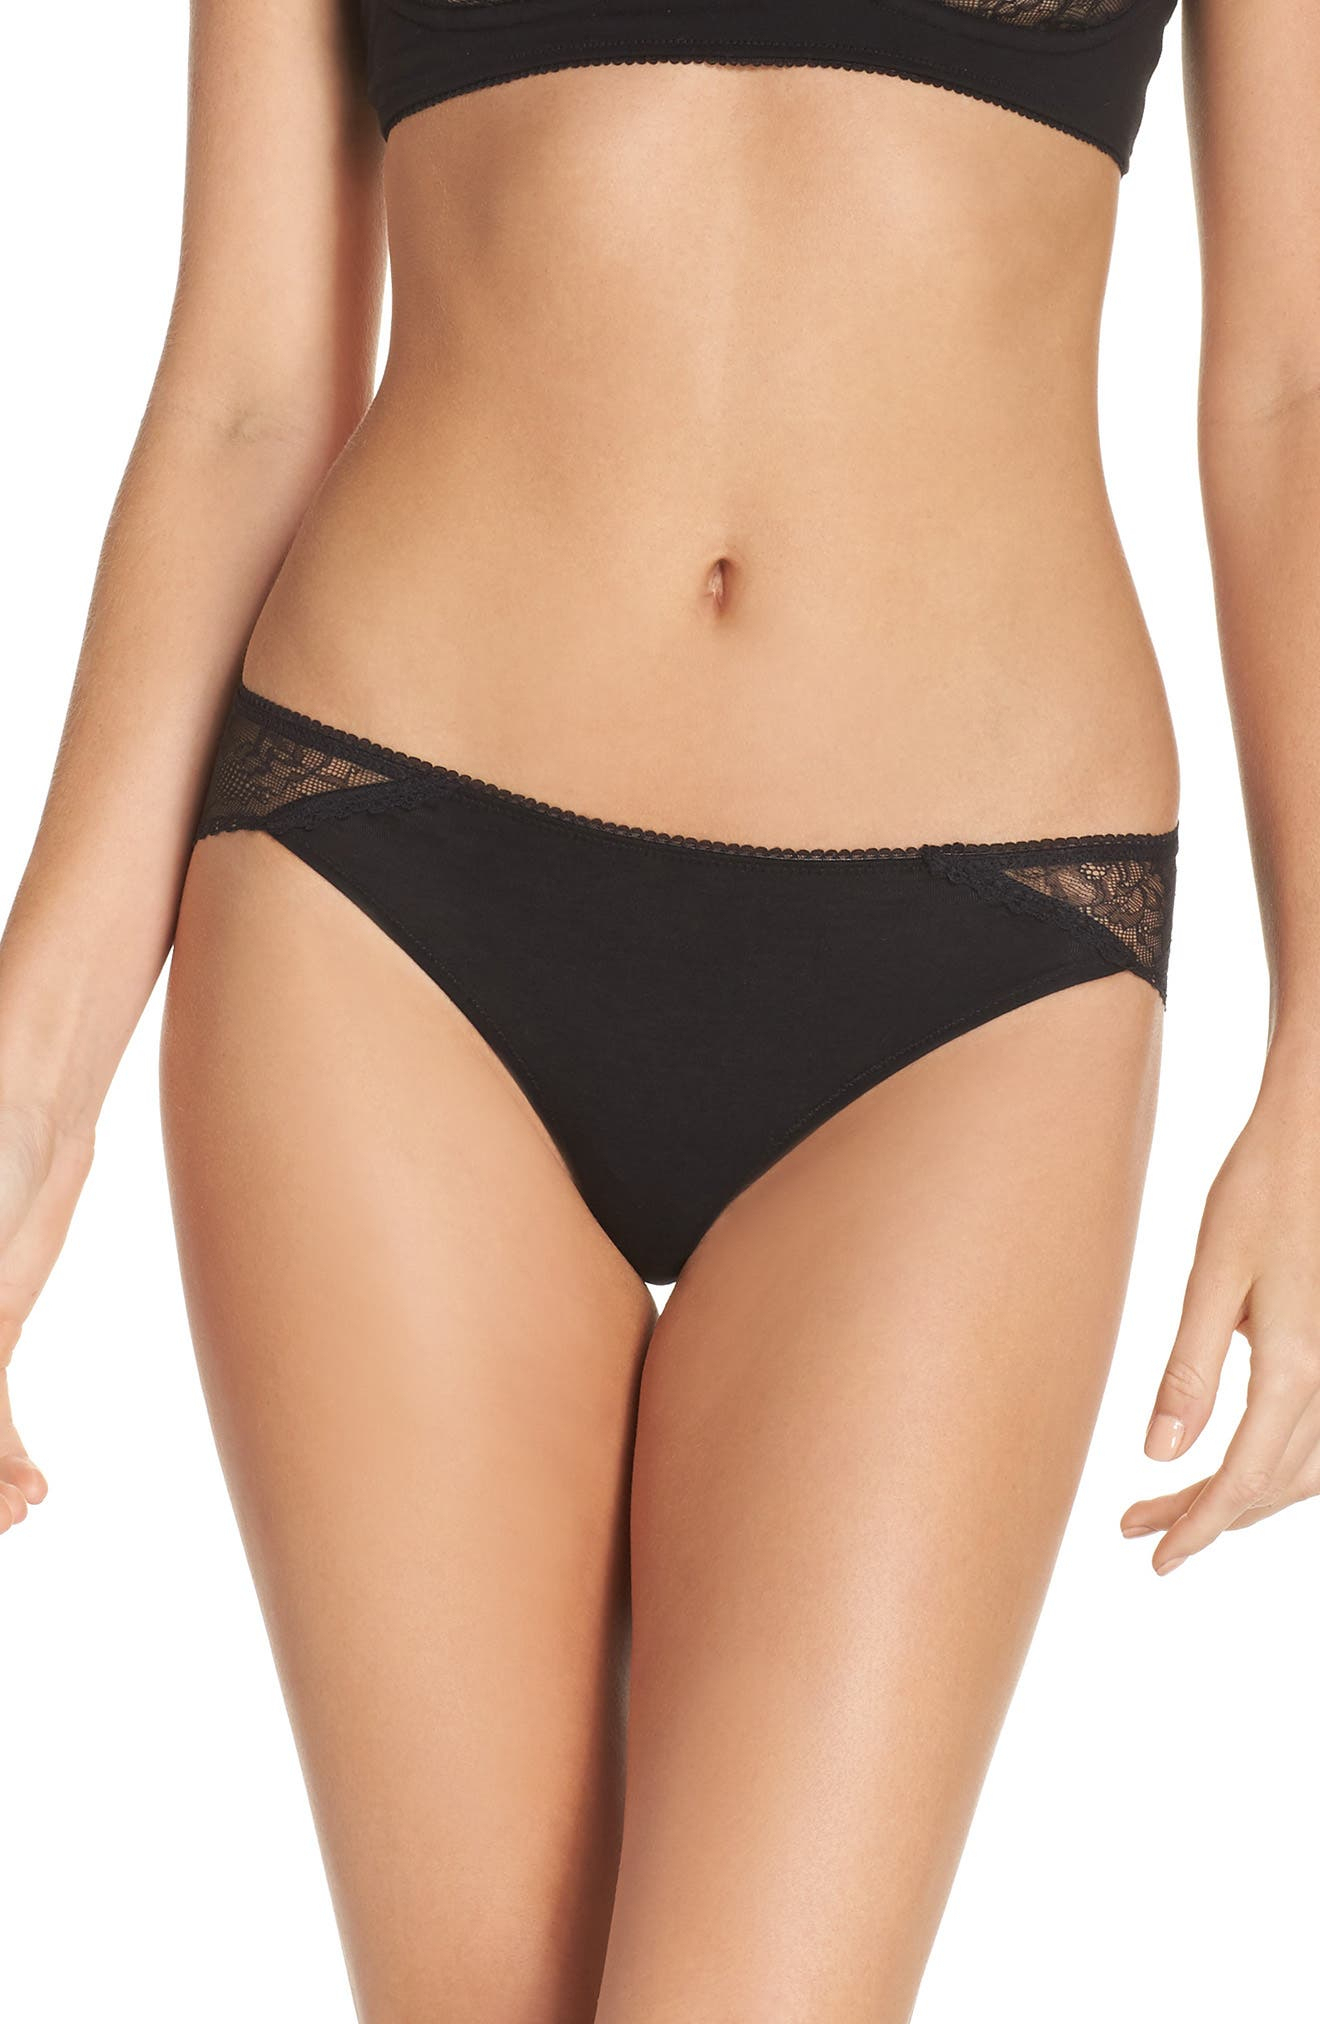 Gracen Lace Bikini,                         Main,                         color, Black